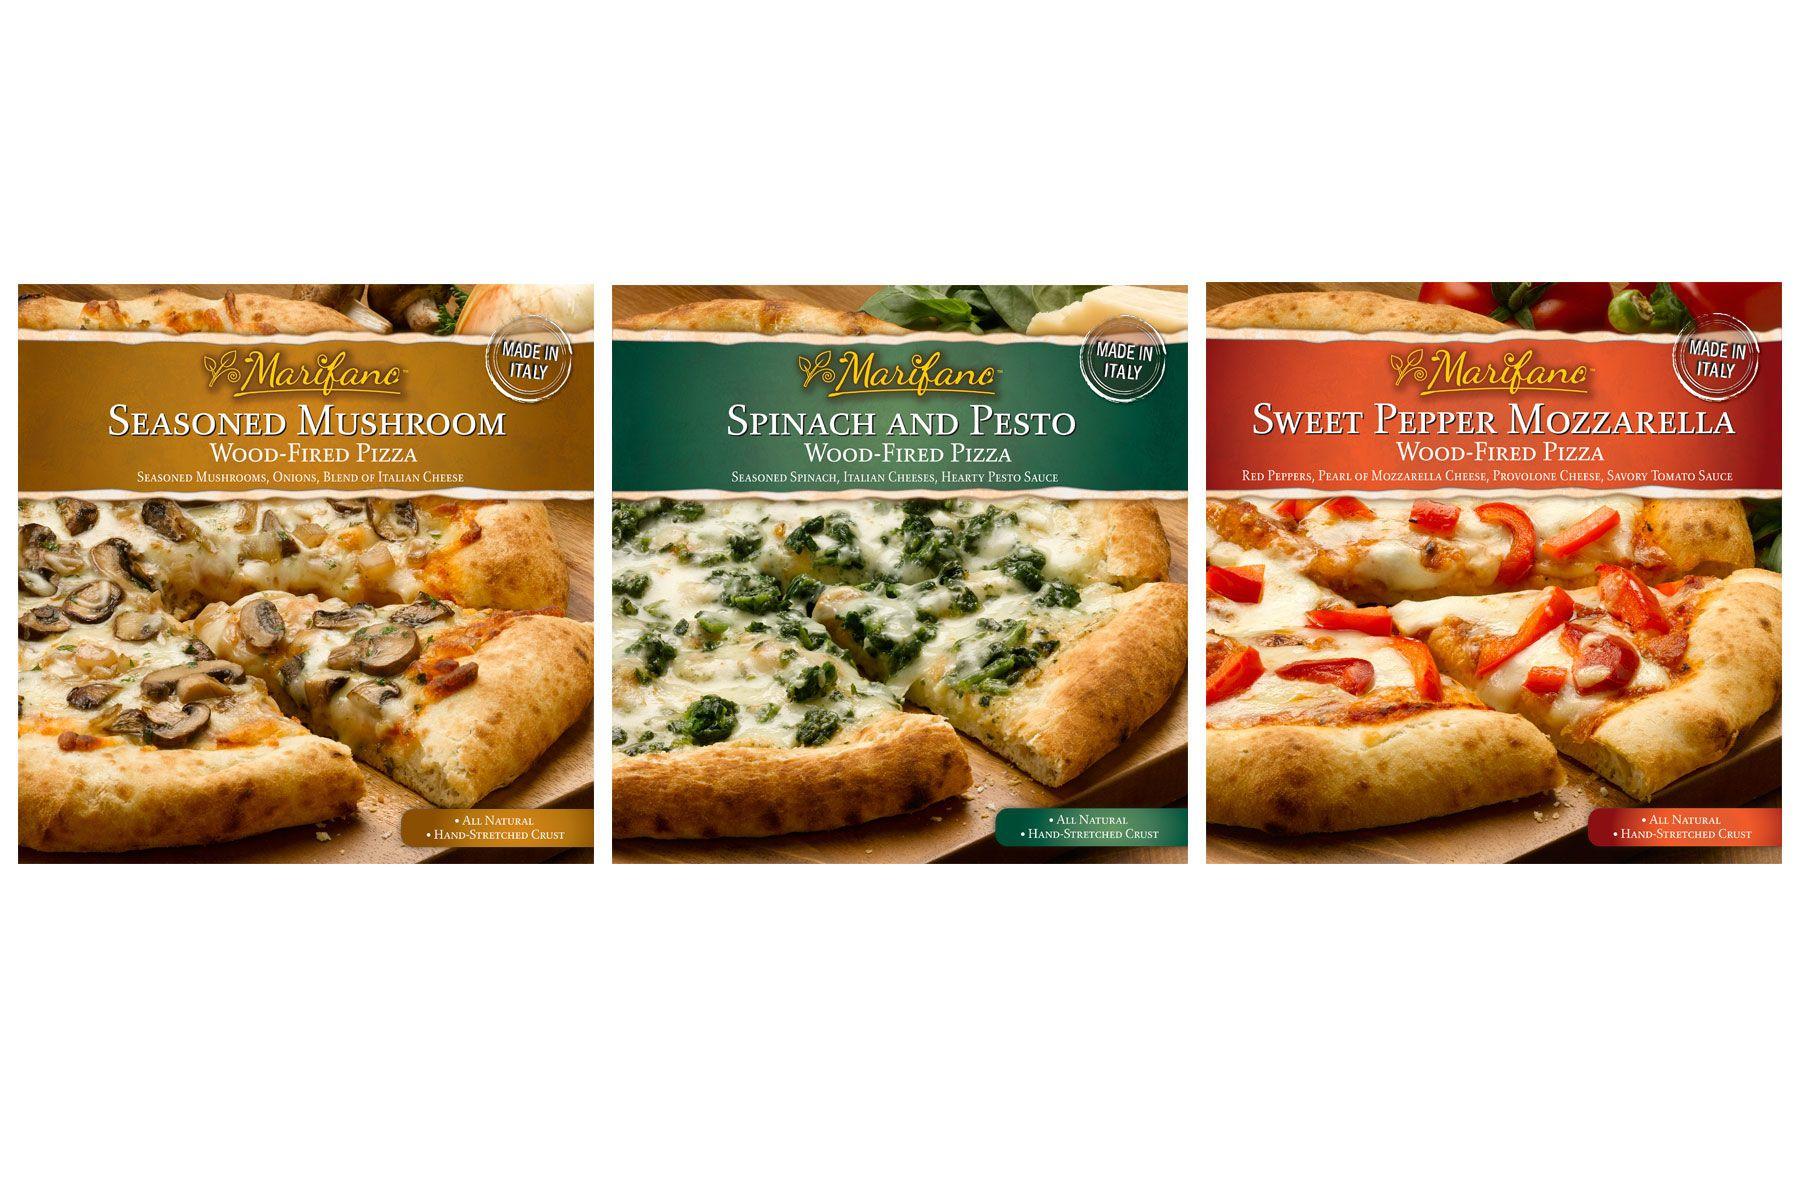 Marifano pizza packaging